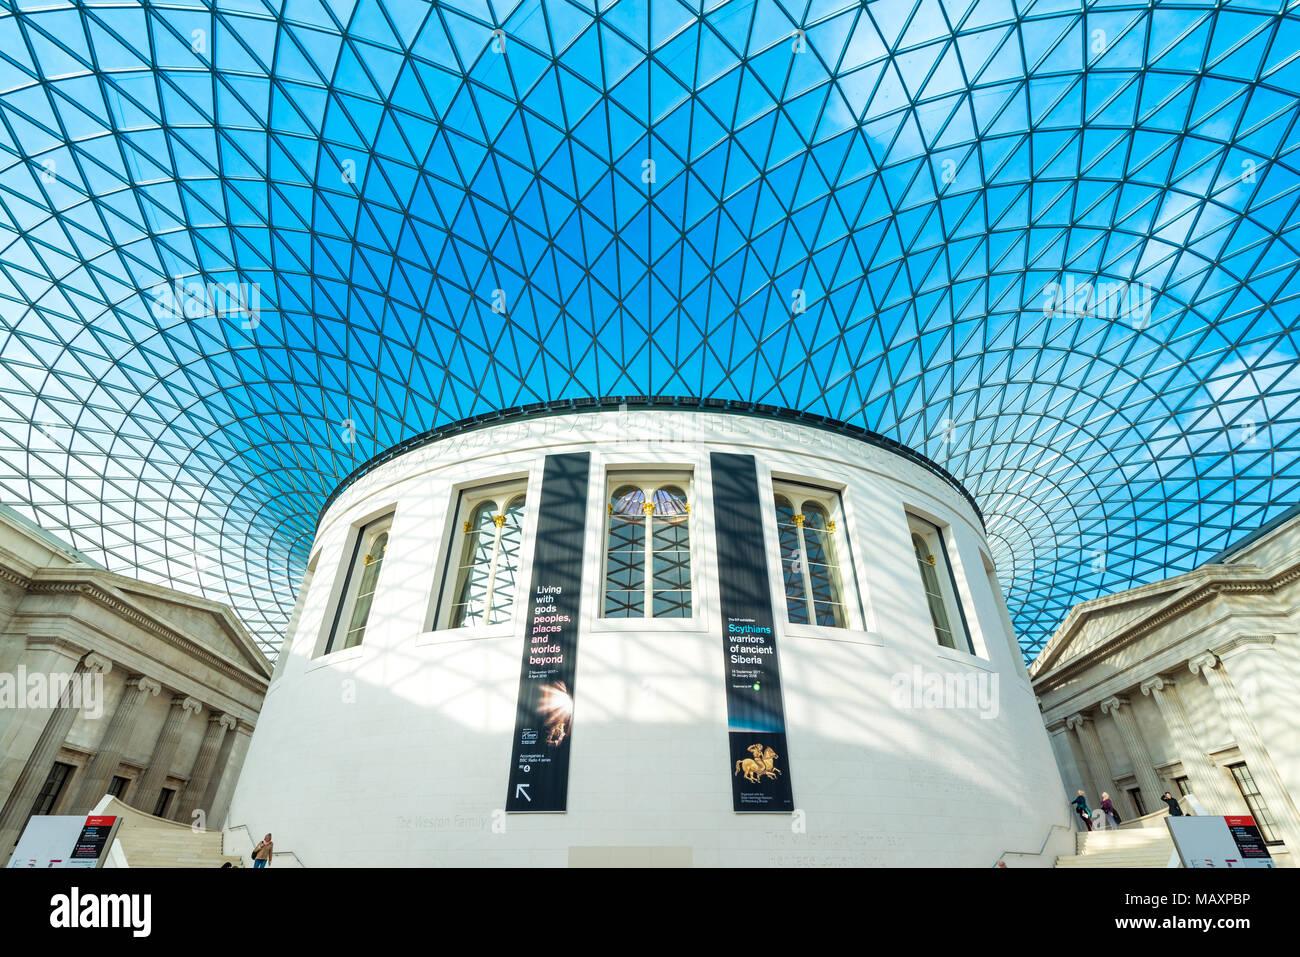 Den Great Court des British Museum, London, UK Stockbild